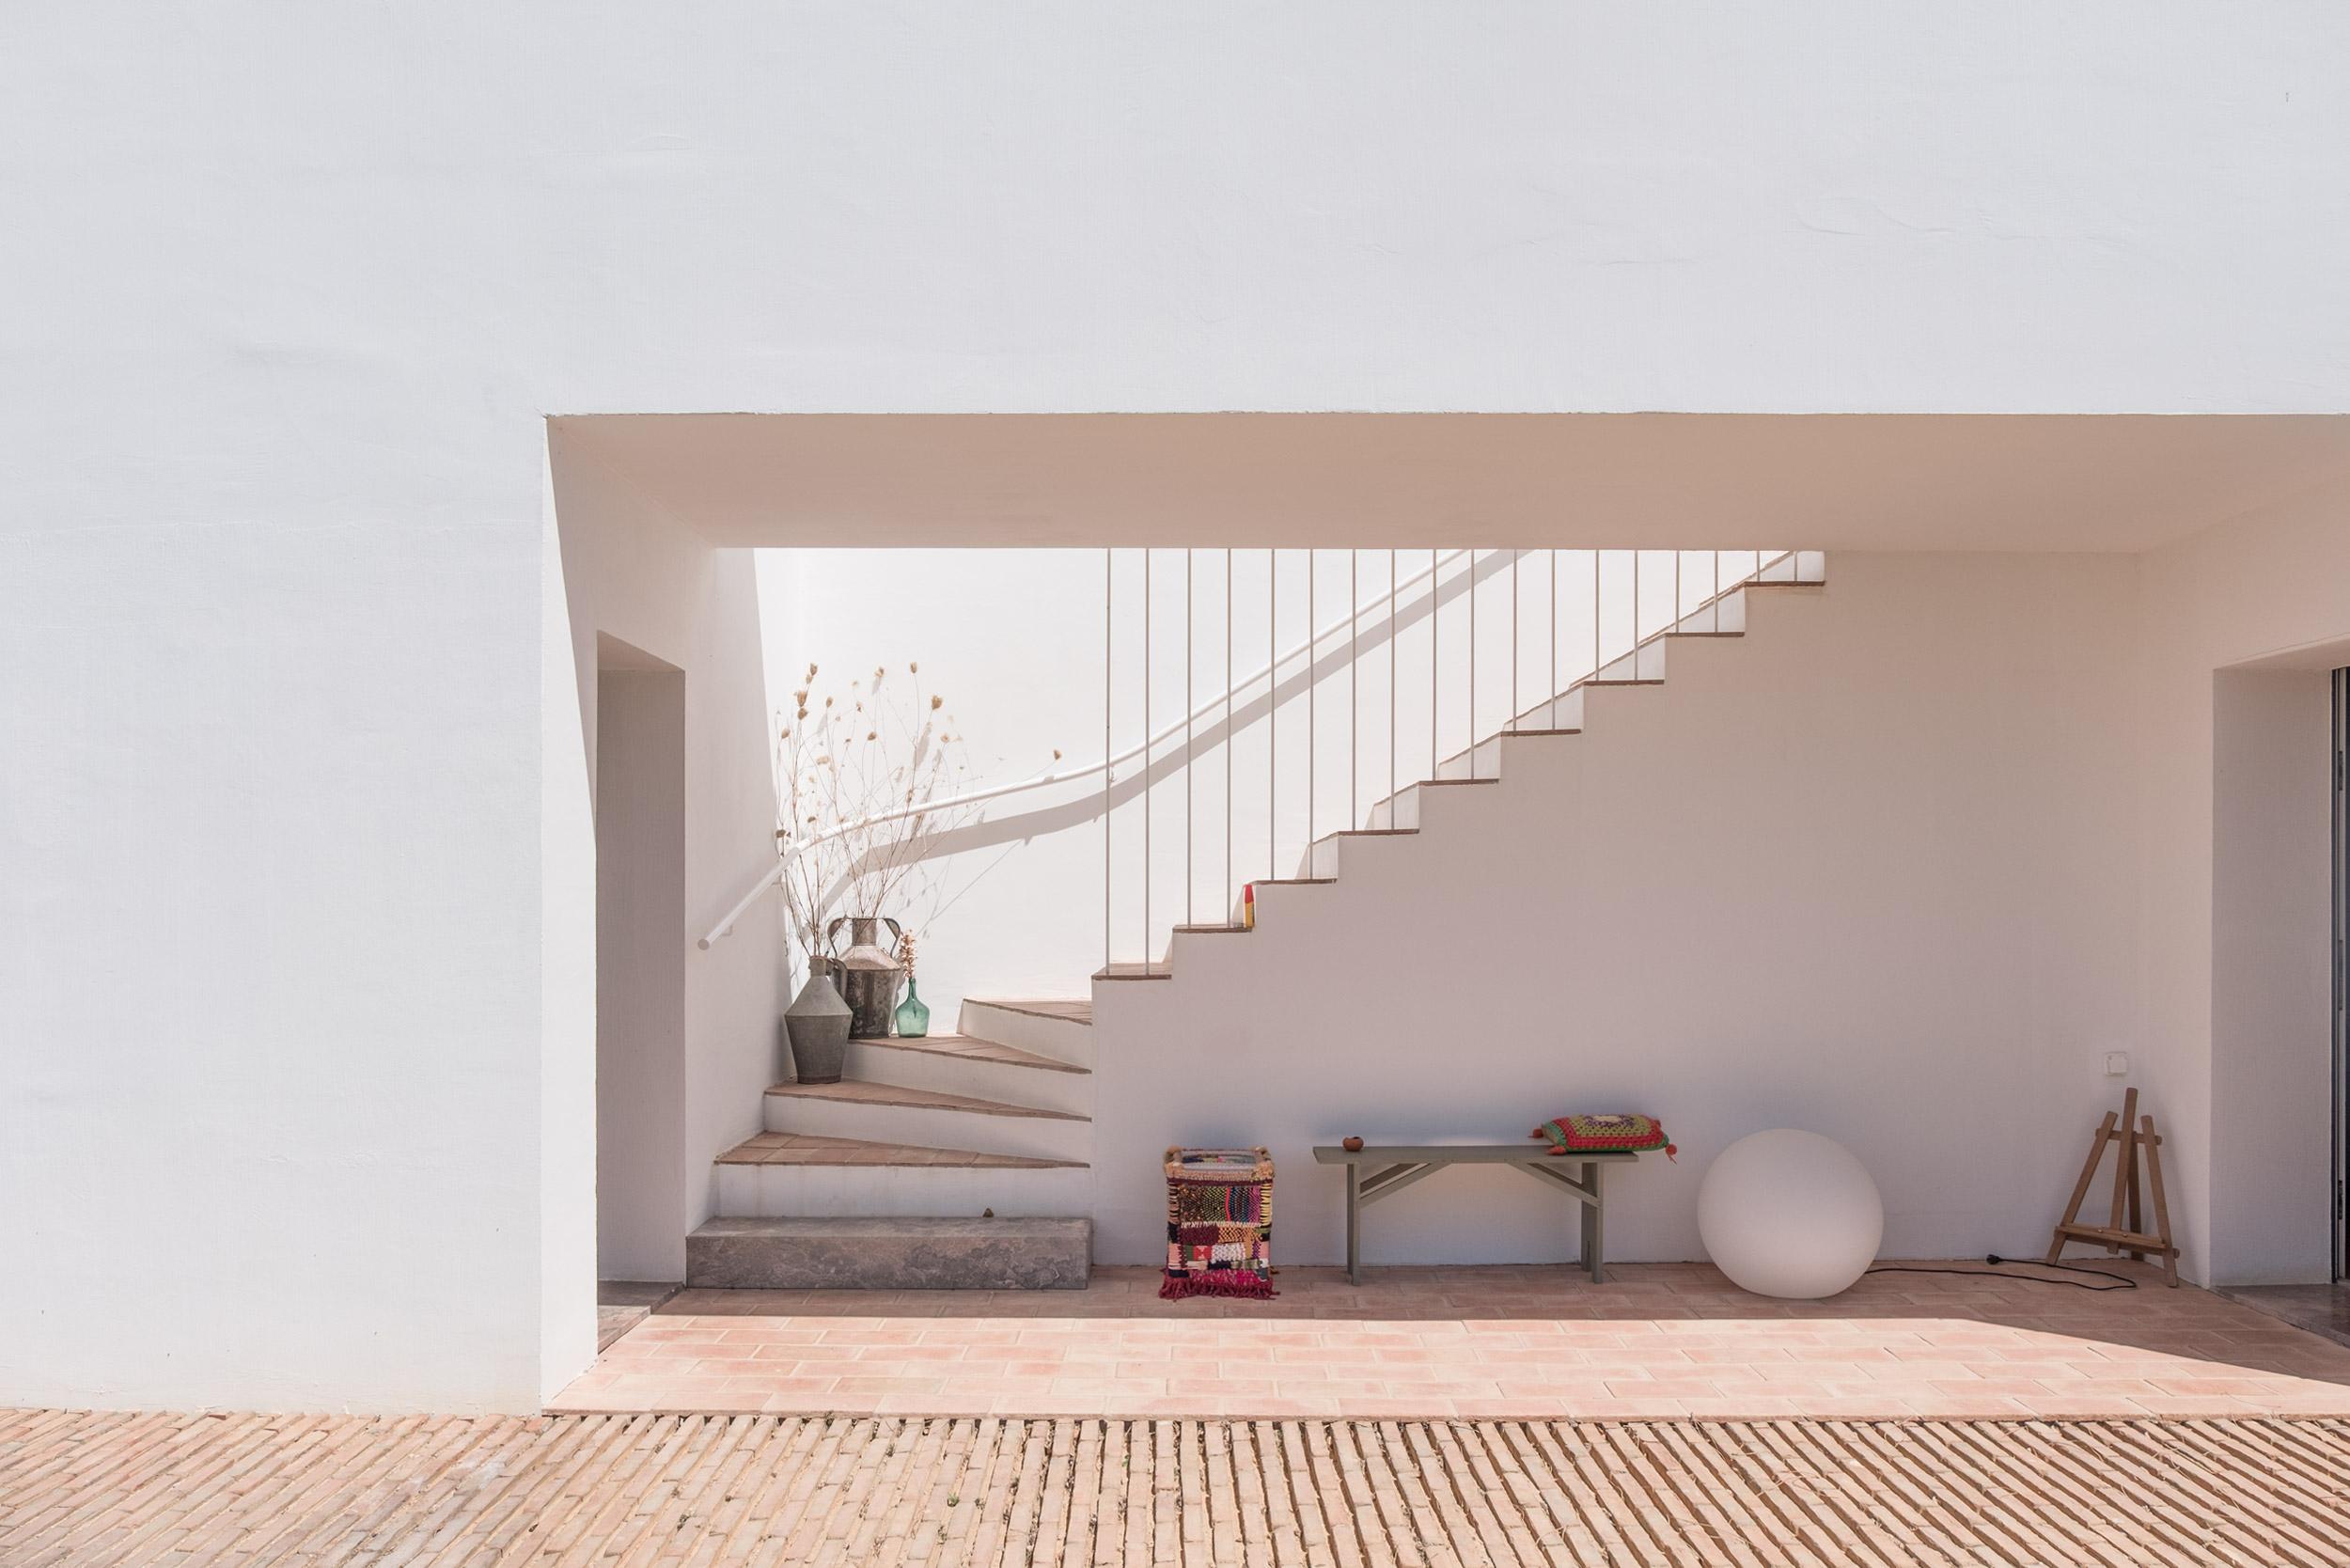 Casa-Modesta-exterior-Fiona-Burrage-Photographer.jpg